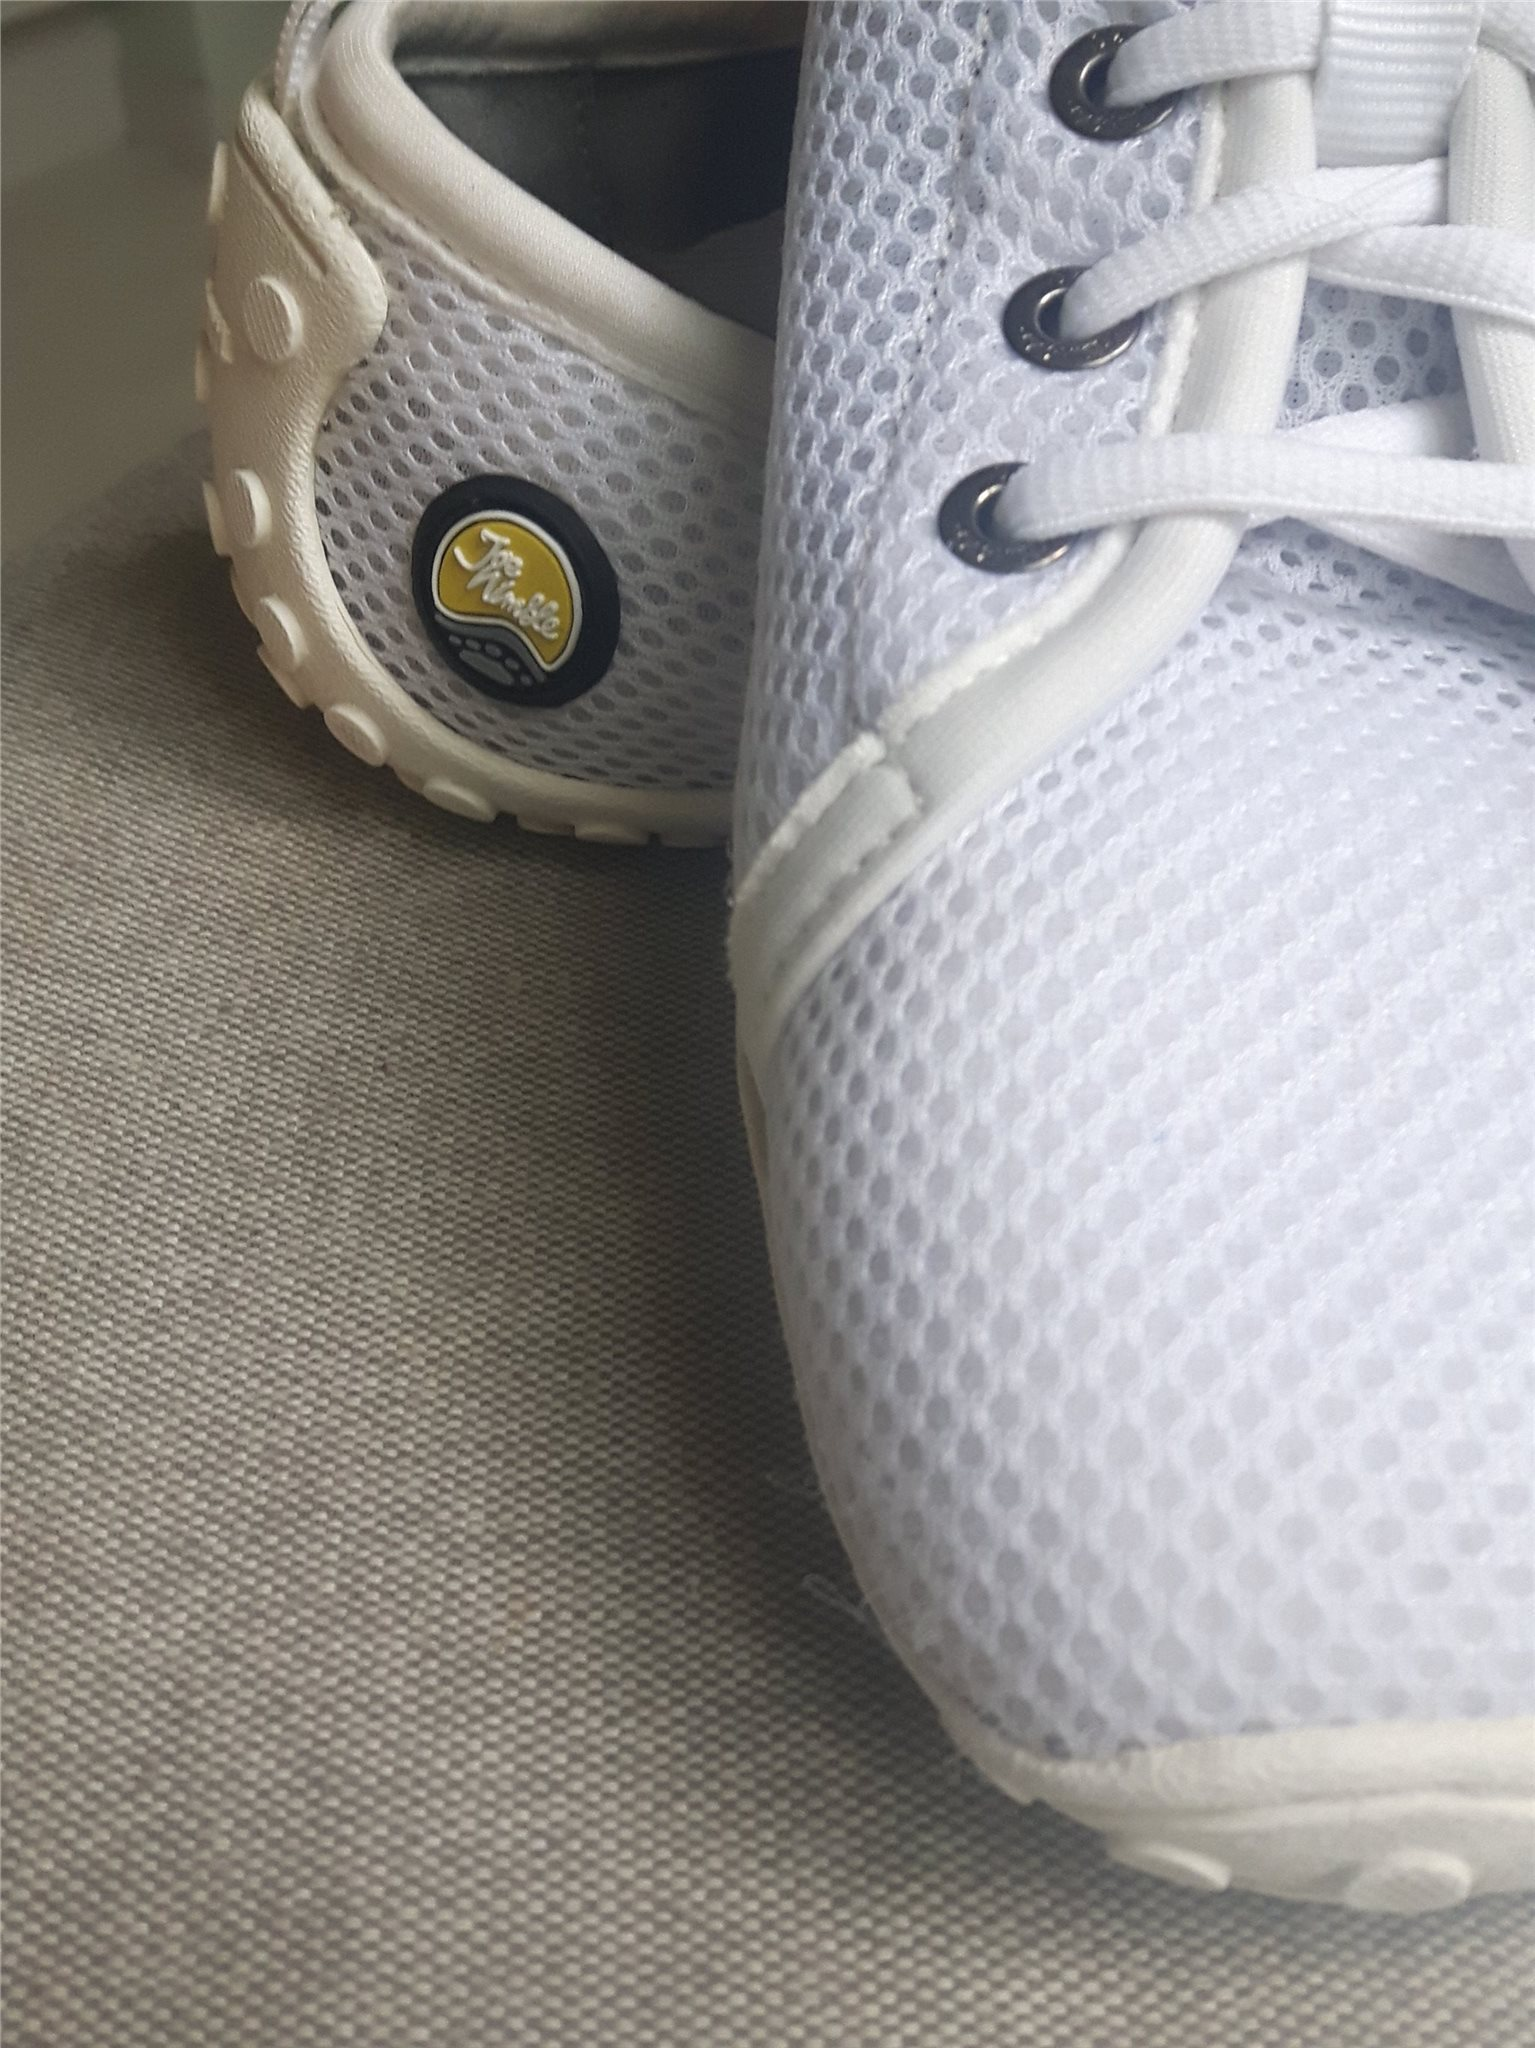 Joe Nimble Vita sneaker Barfotaskor Mkt Fräscha.. (333608175) ᐈ Köp ... cefe7673be897